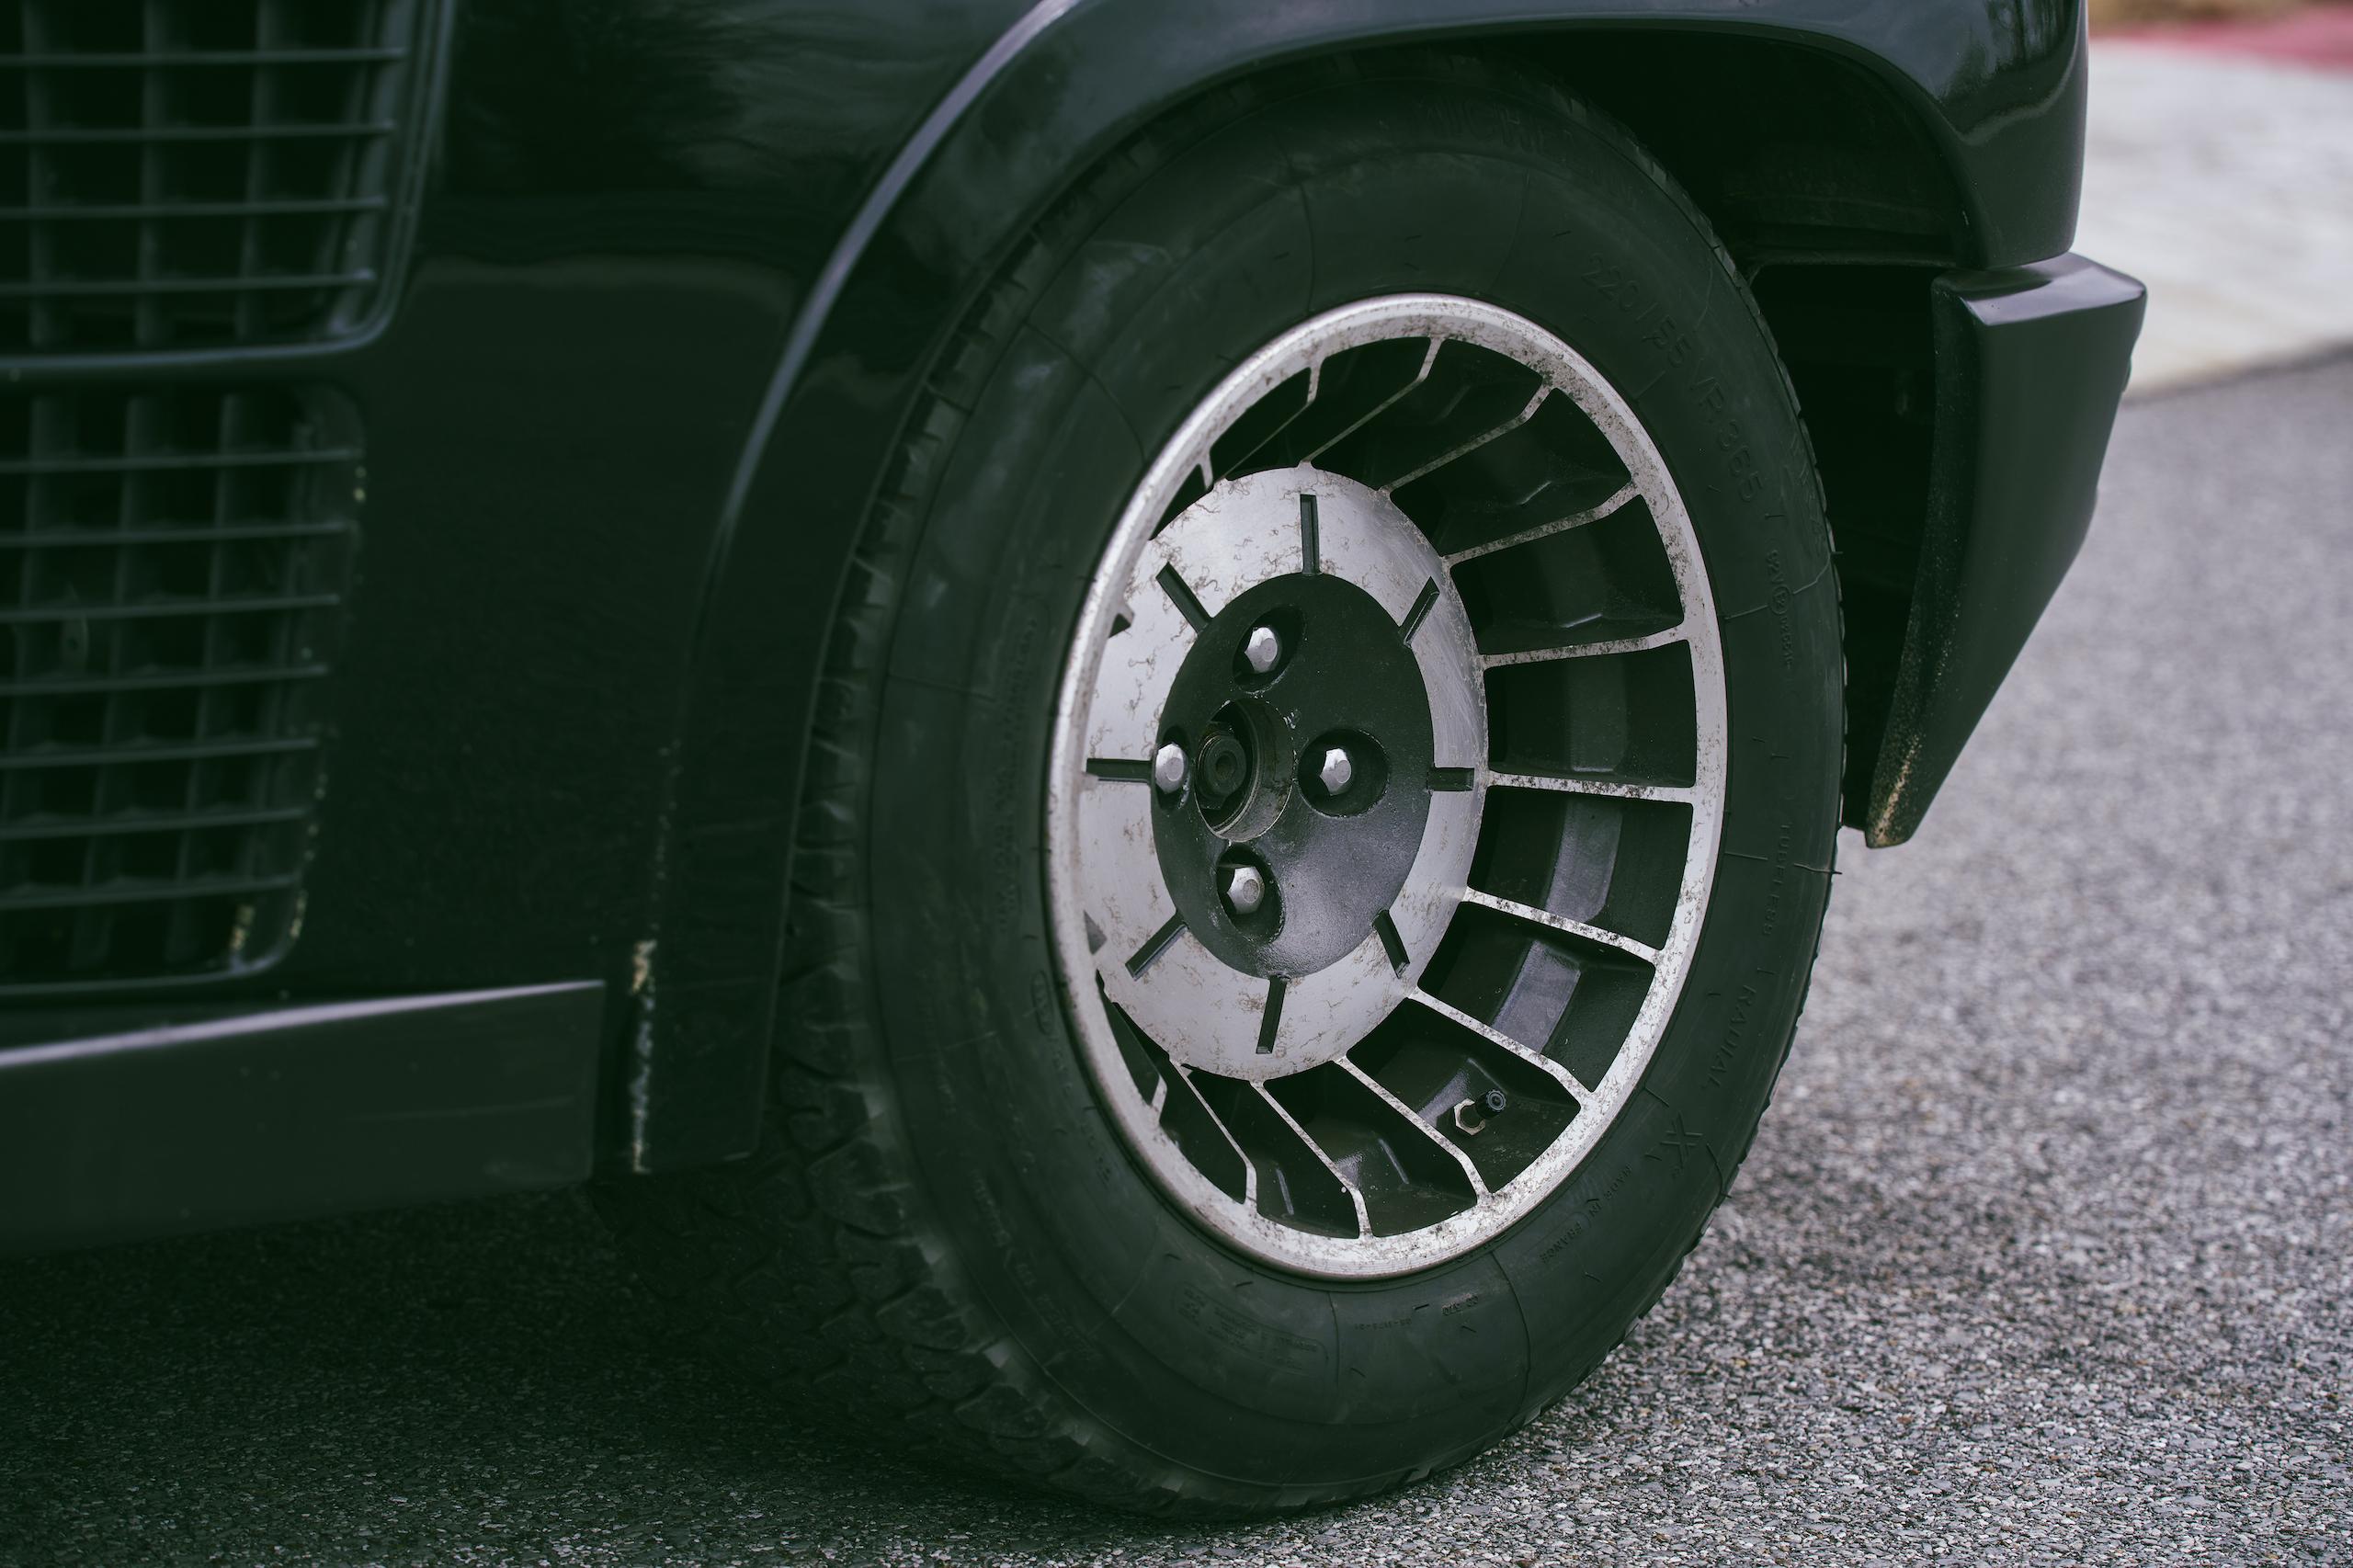 1985 Renault R5 Turbo 2 rear wheel detail